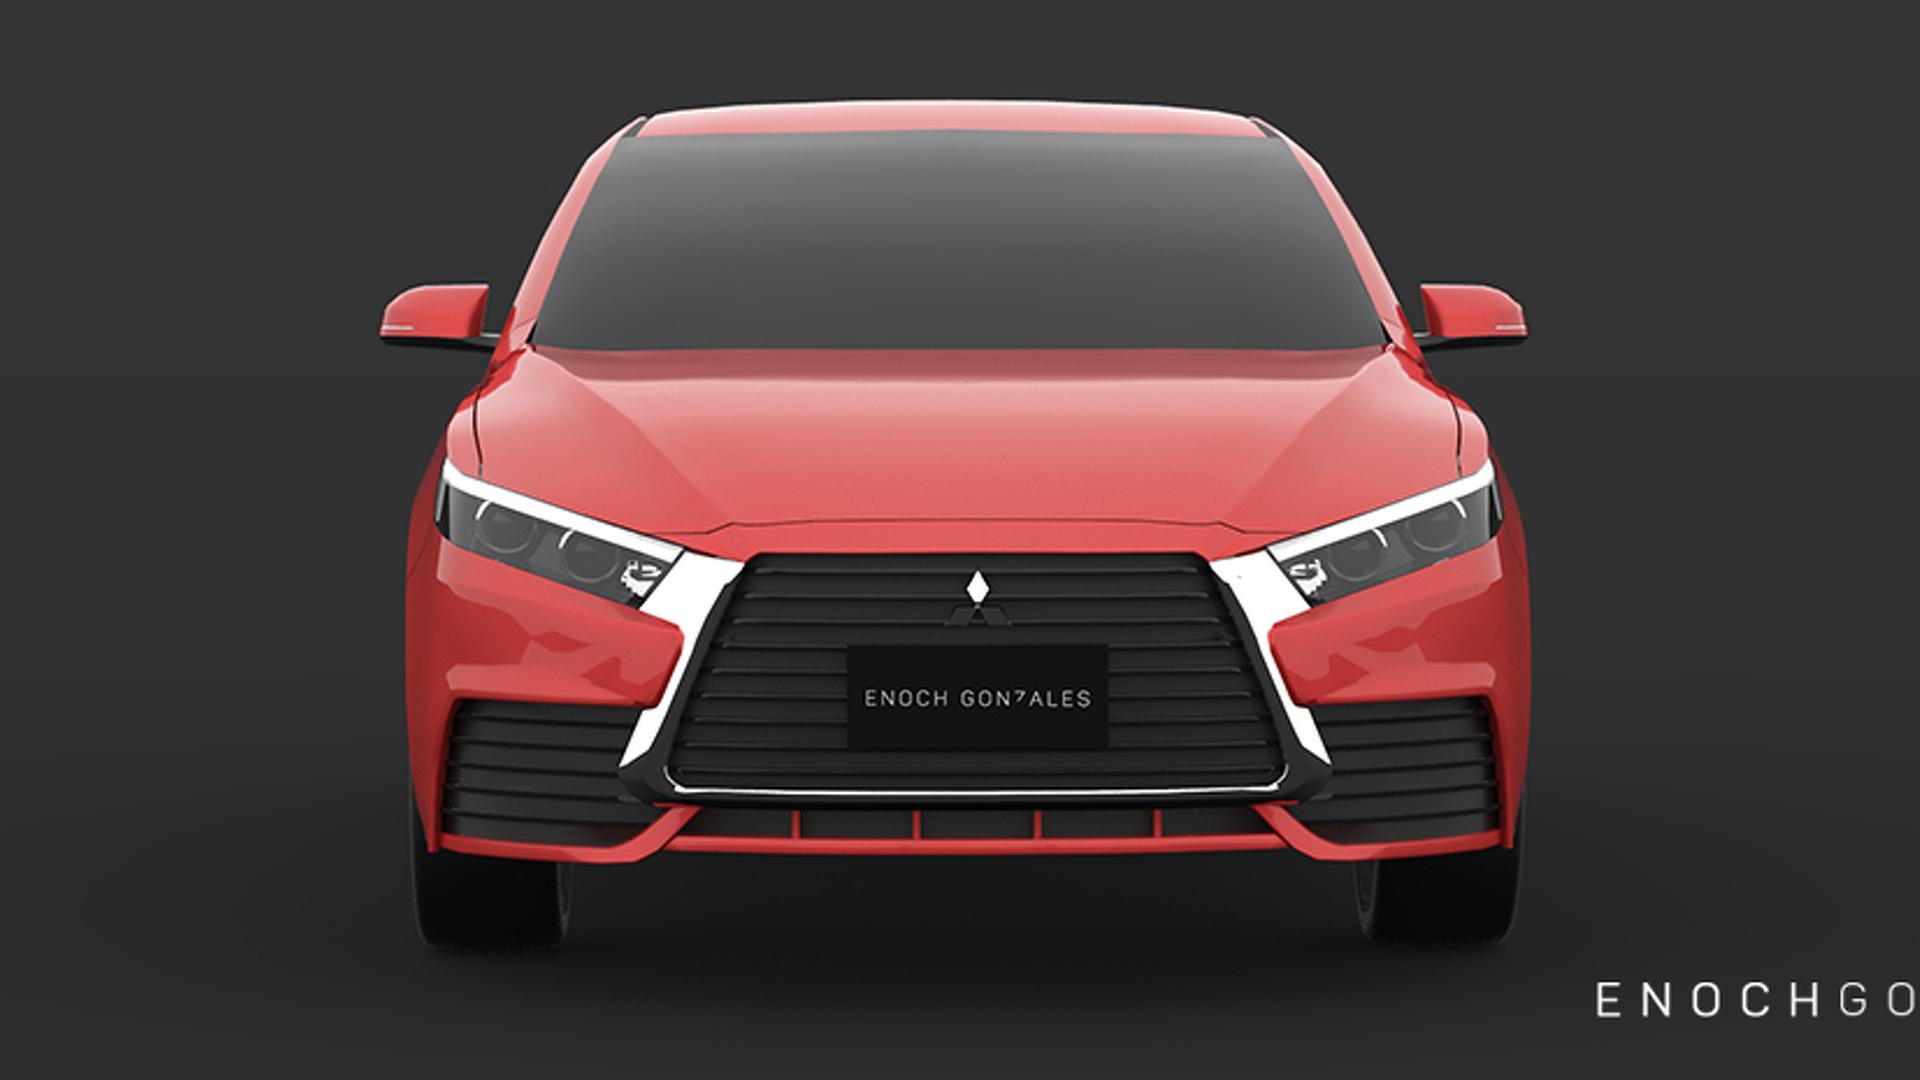 2018 Mitsubishi Lancer imagined, will never happen